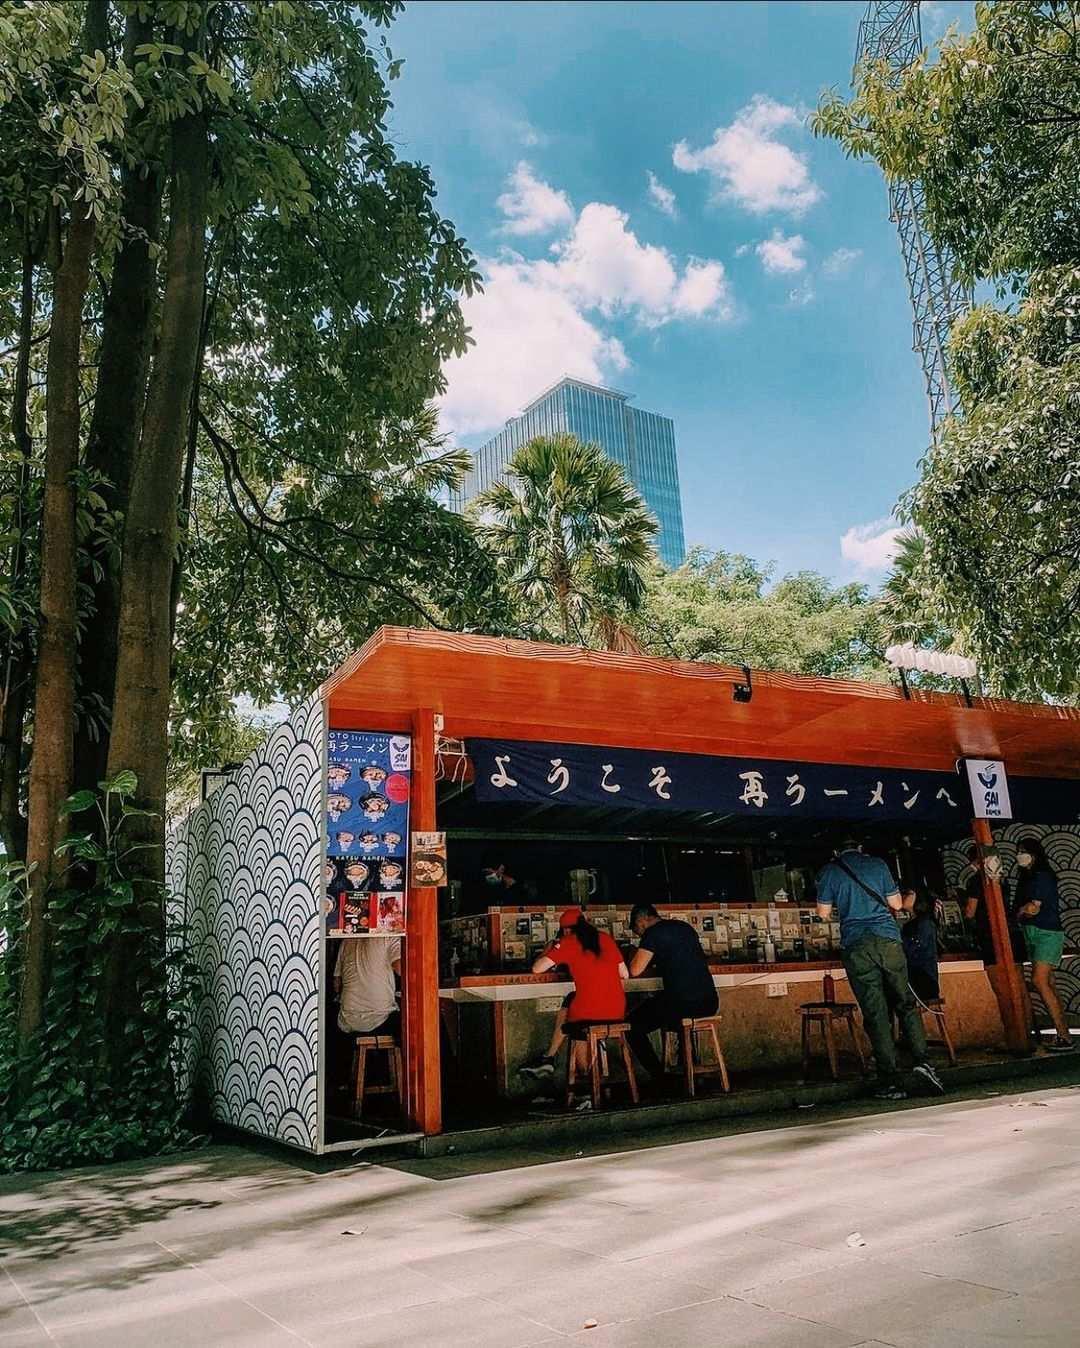 Foto Pengunjung Yang Sedang Makan di SAI Ramen Alam Sutera Image From @sai.ramen_